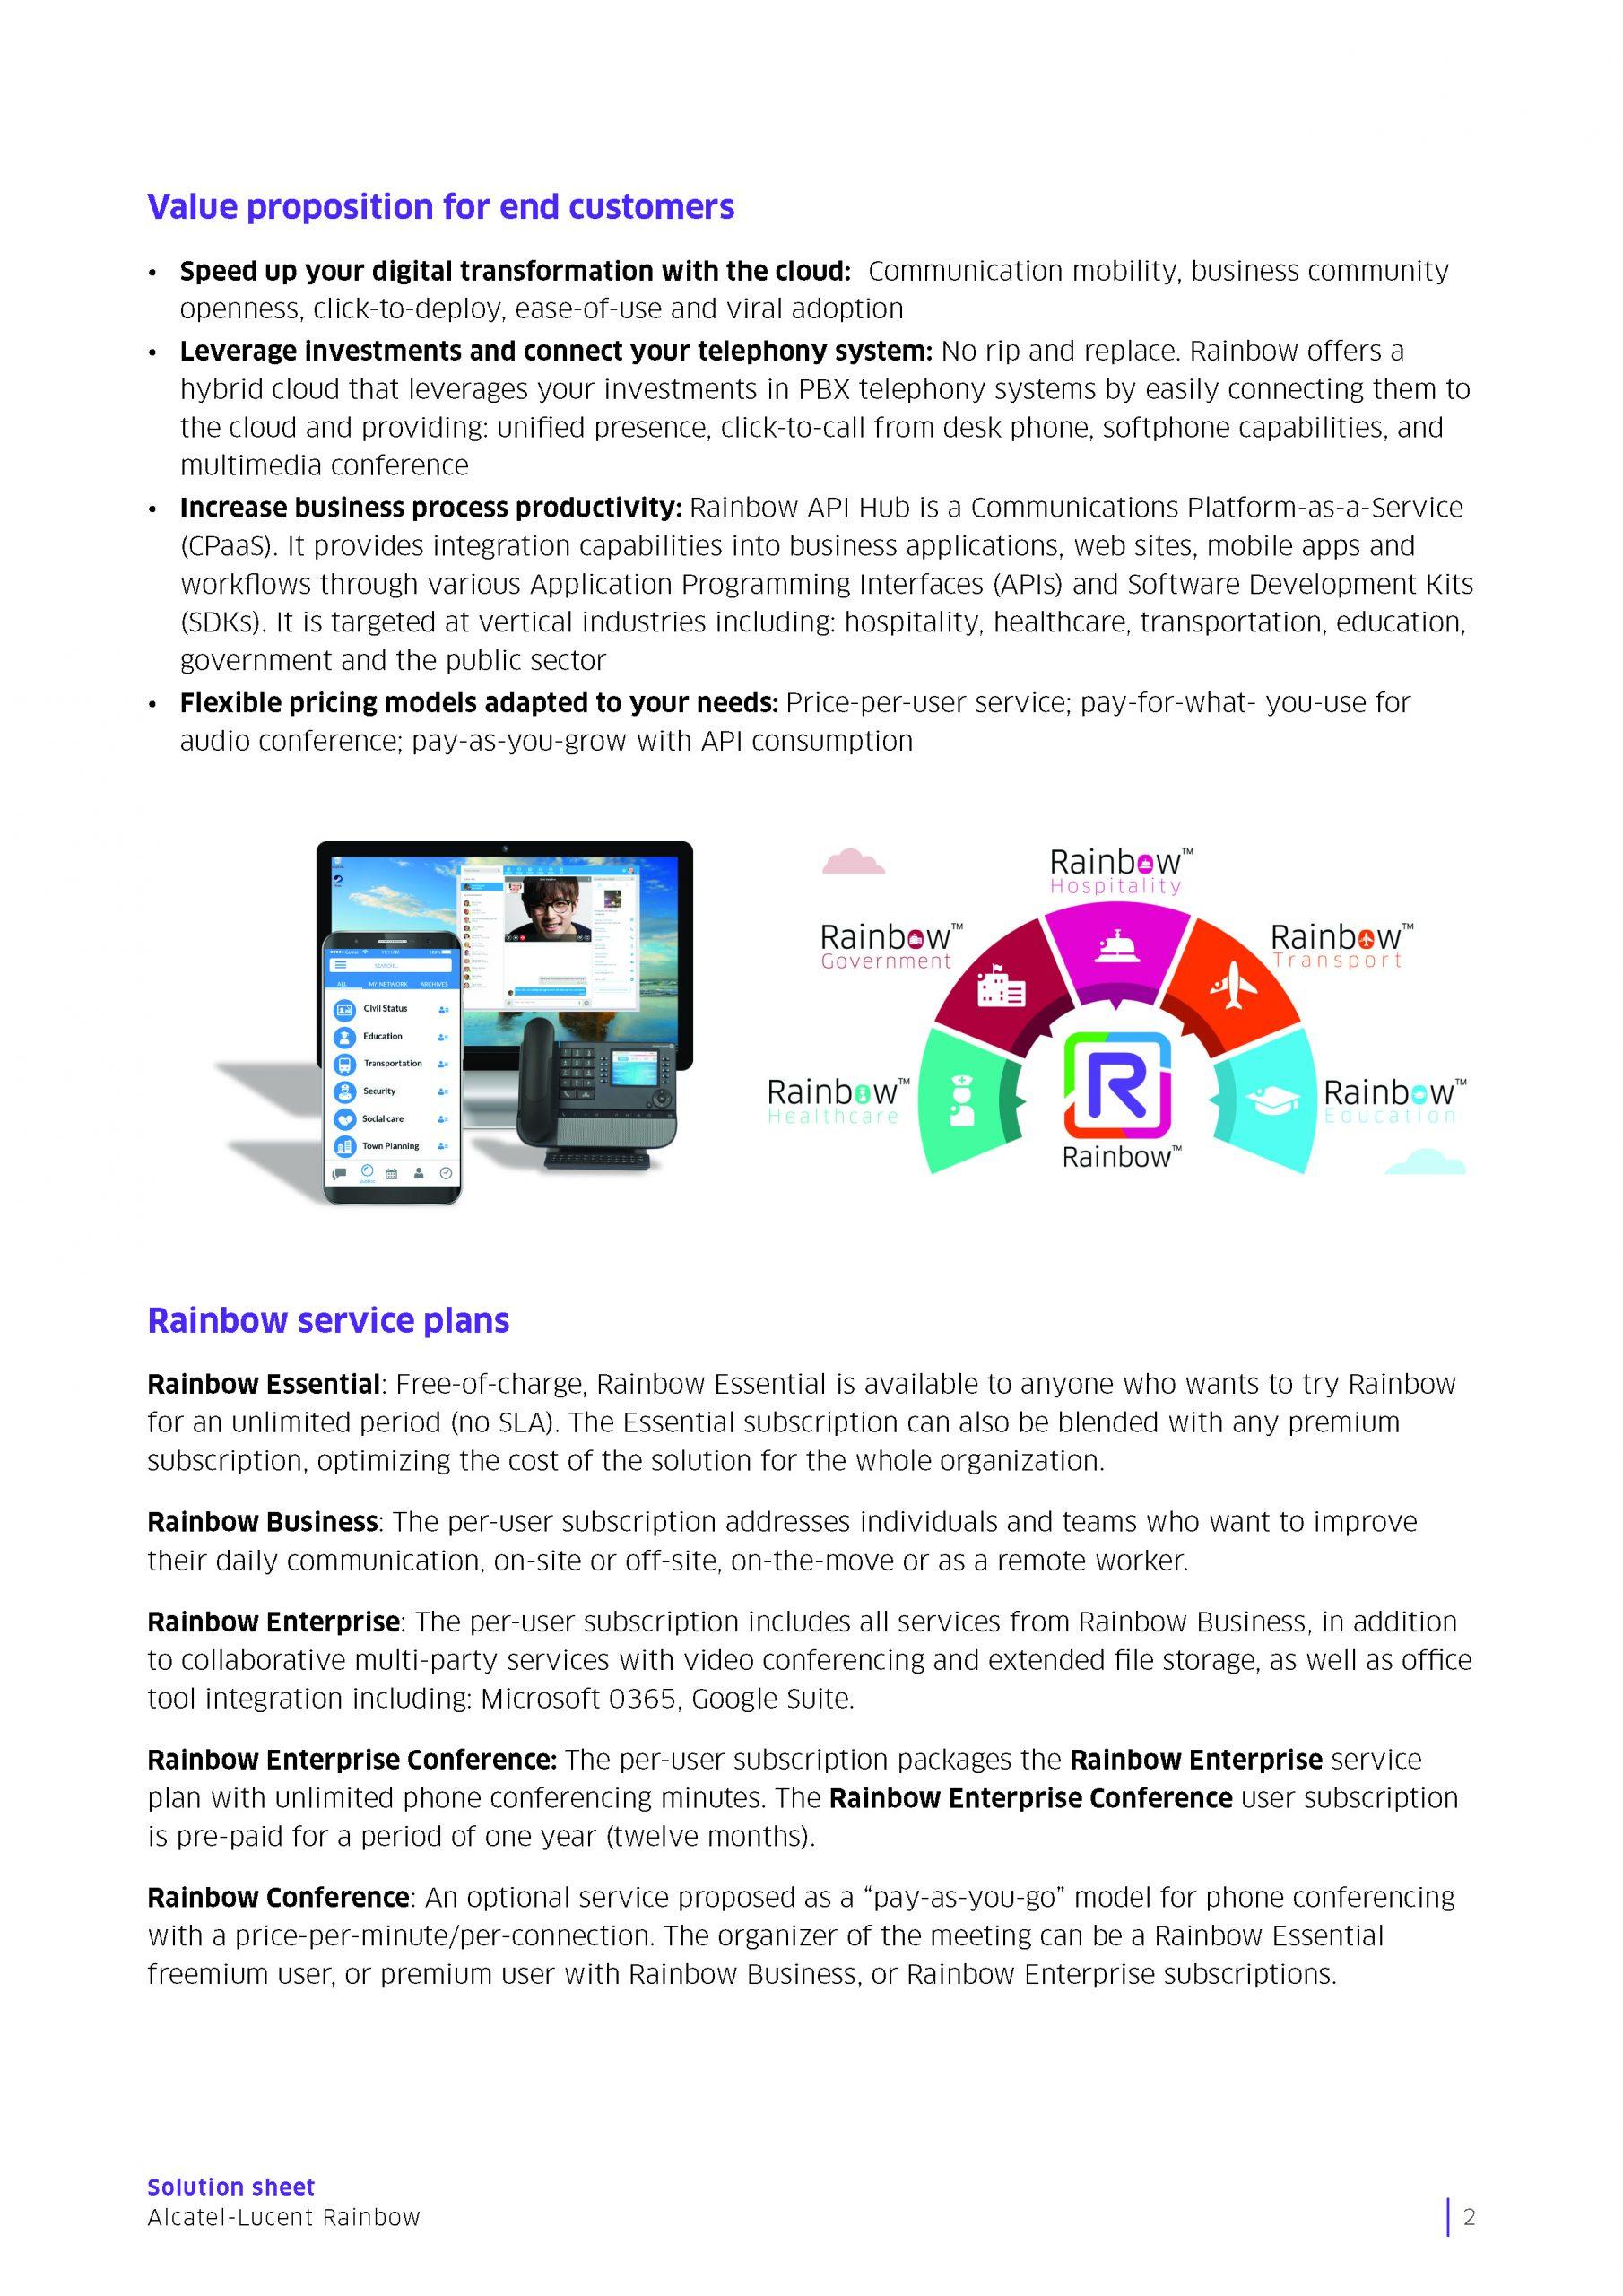 rainbow-solutionsheet-en_Page_2